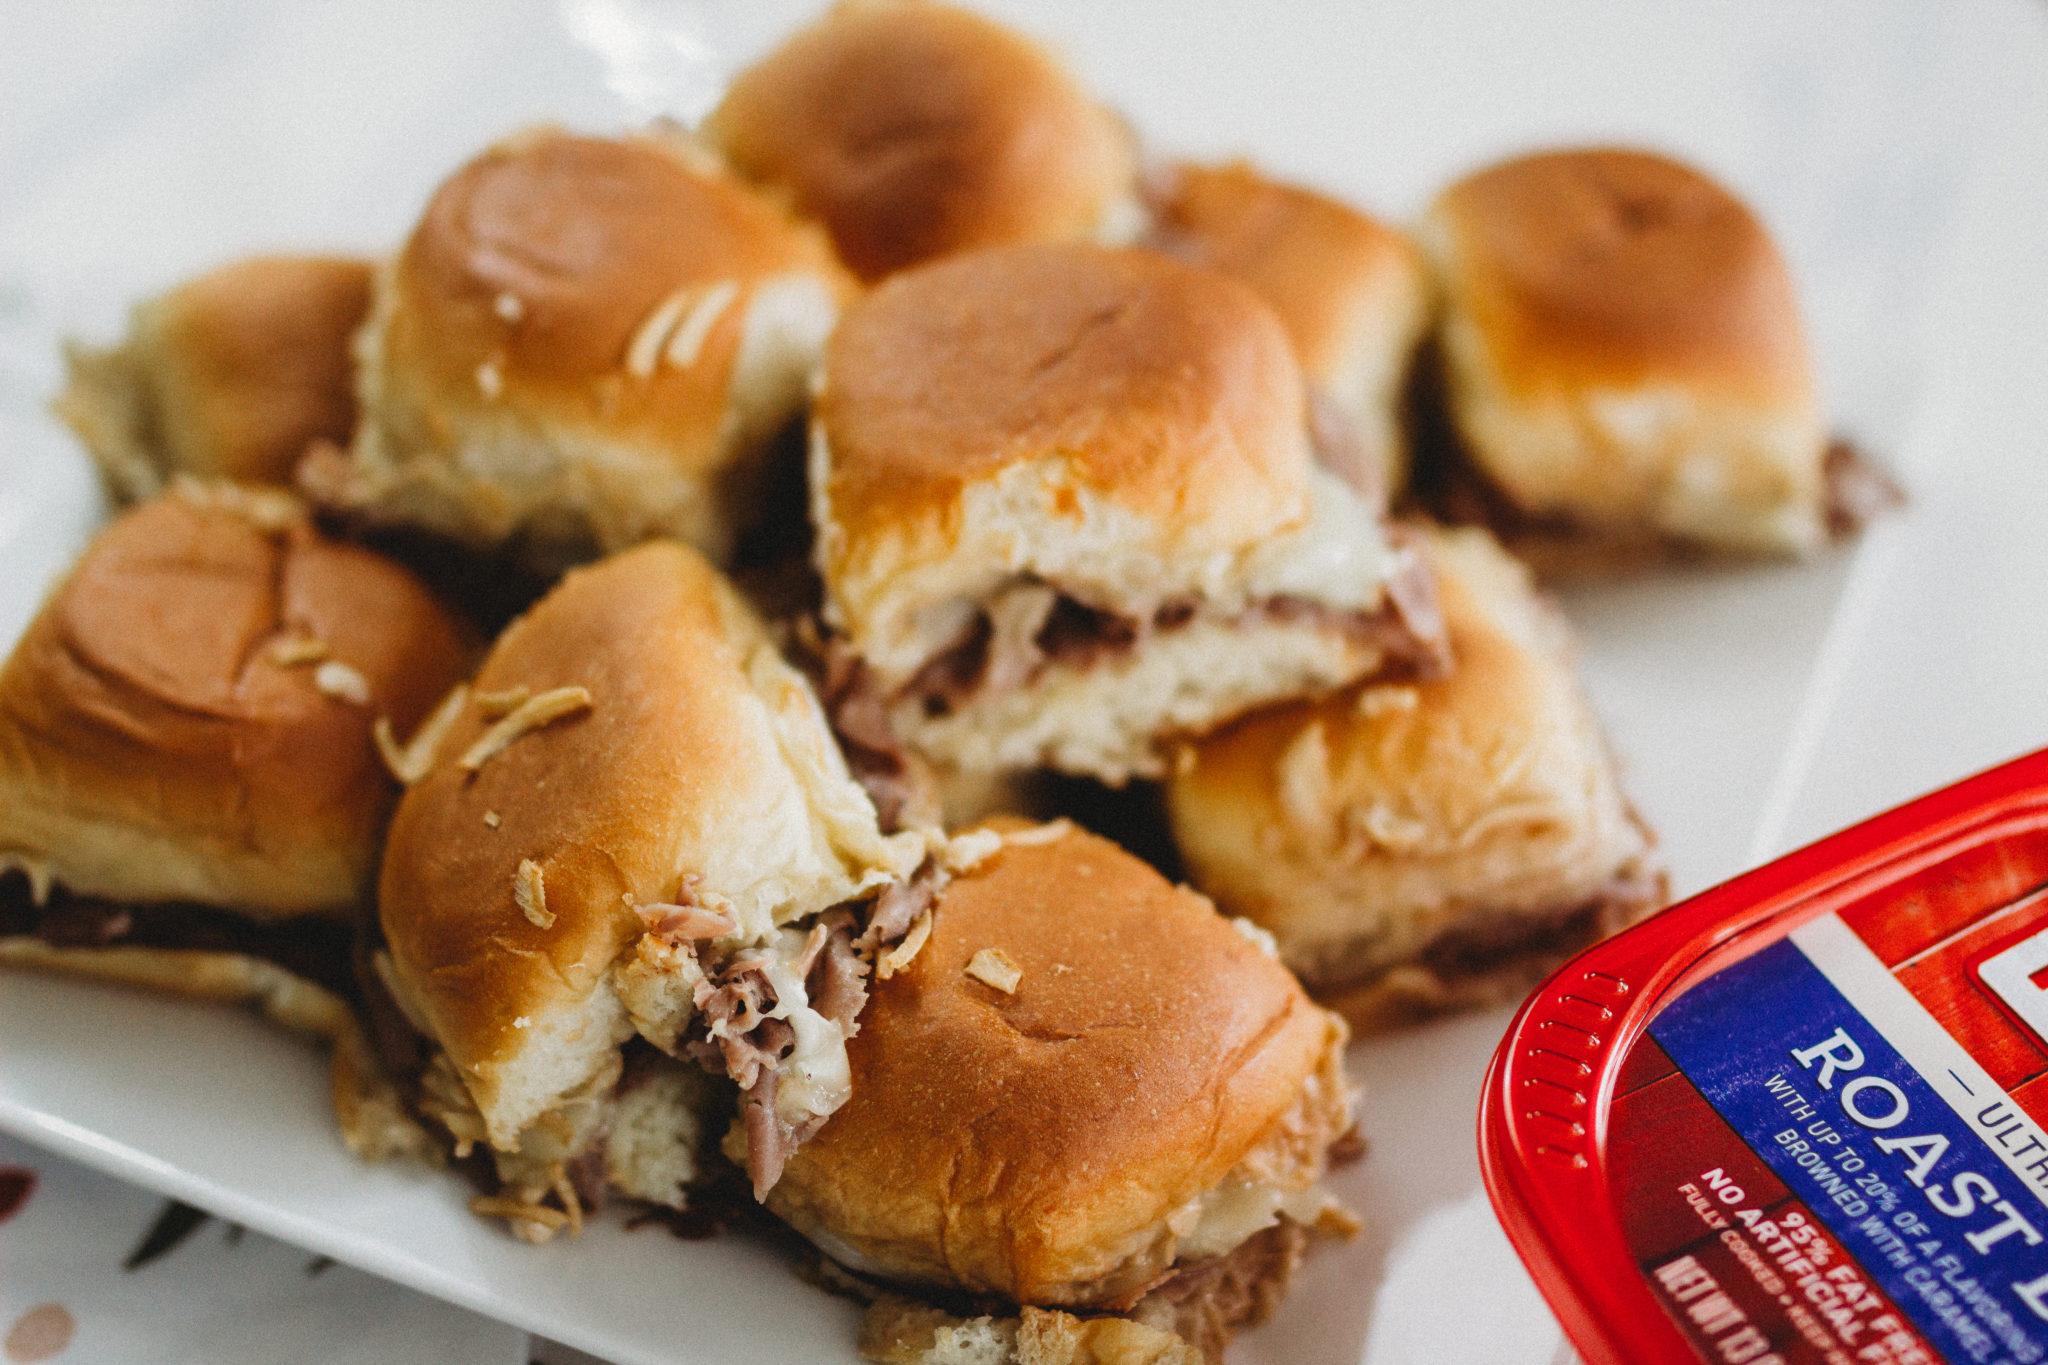 Celebrate the big game with these tasty French Dip Sliders using Hillshire Farm thin sliced roast beef #ad #TysonWinningLineup #Walmart